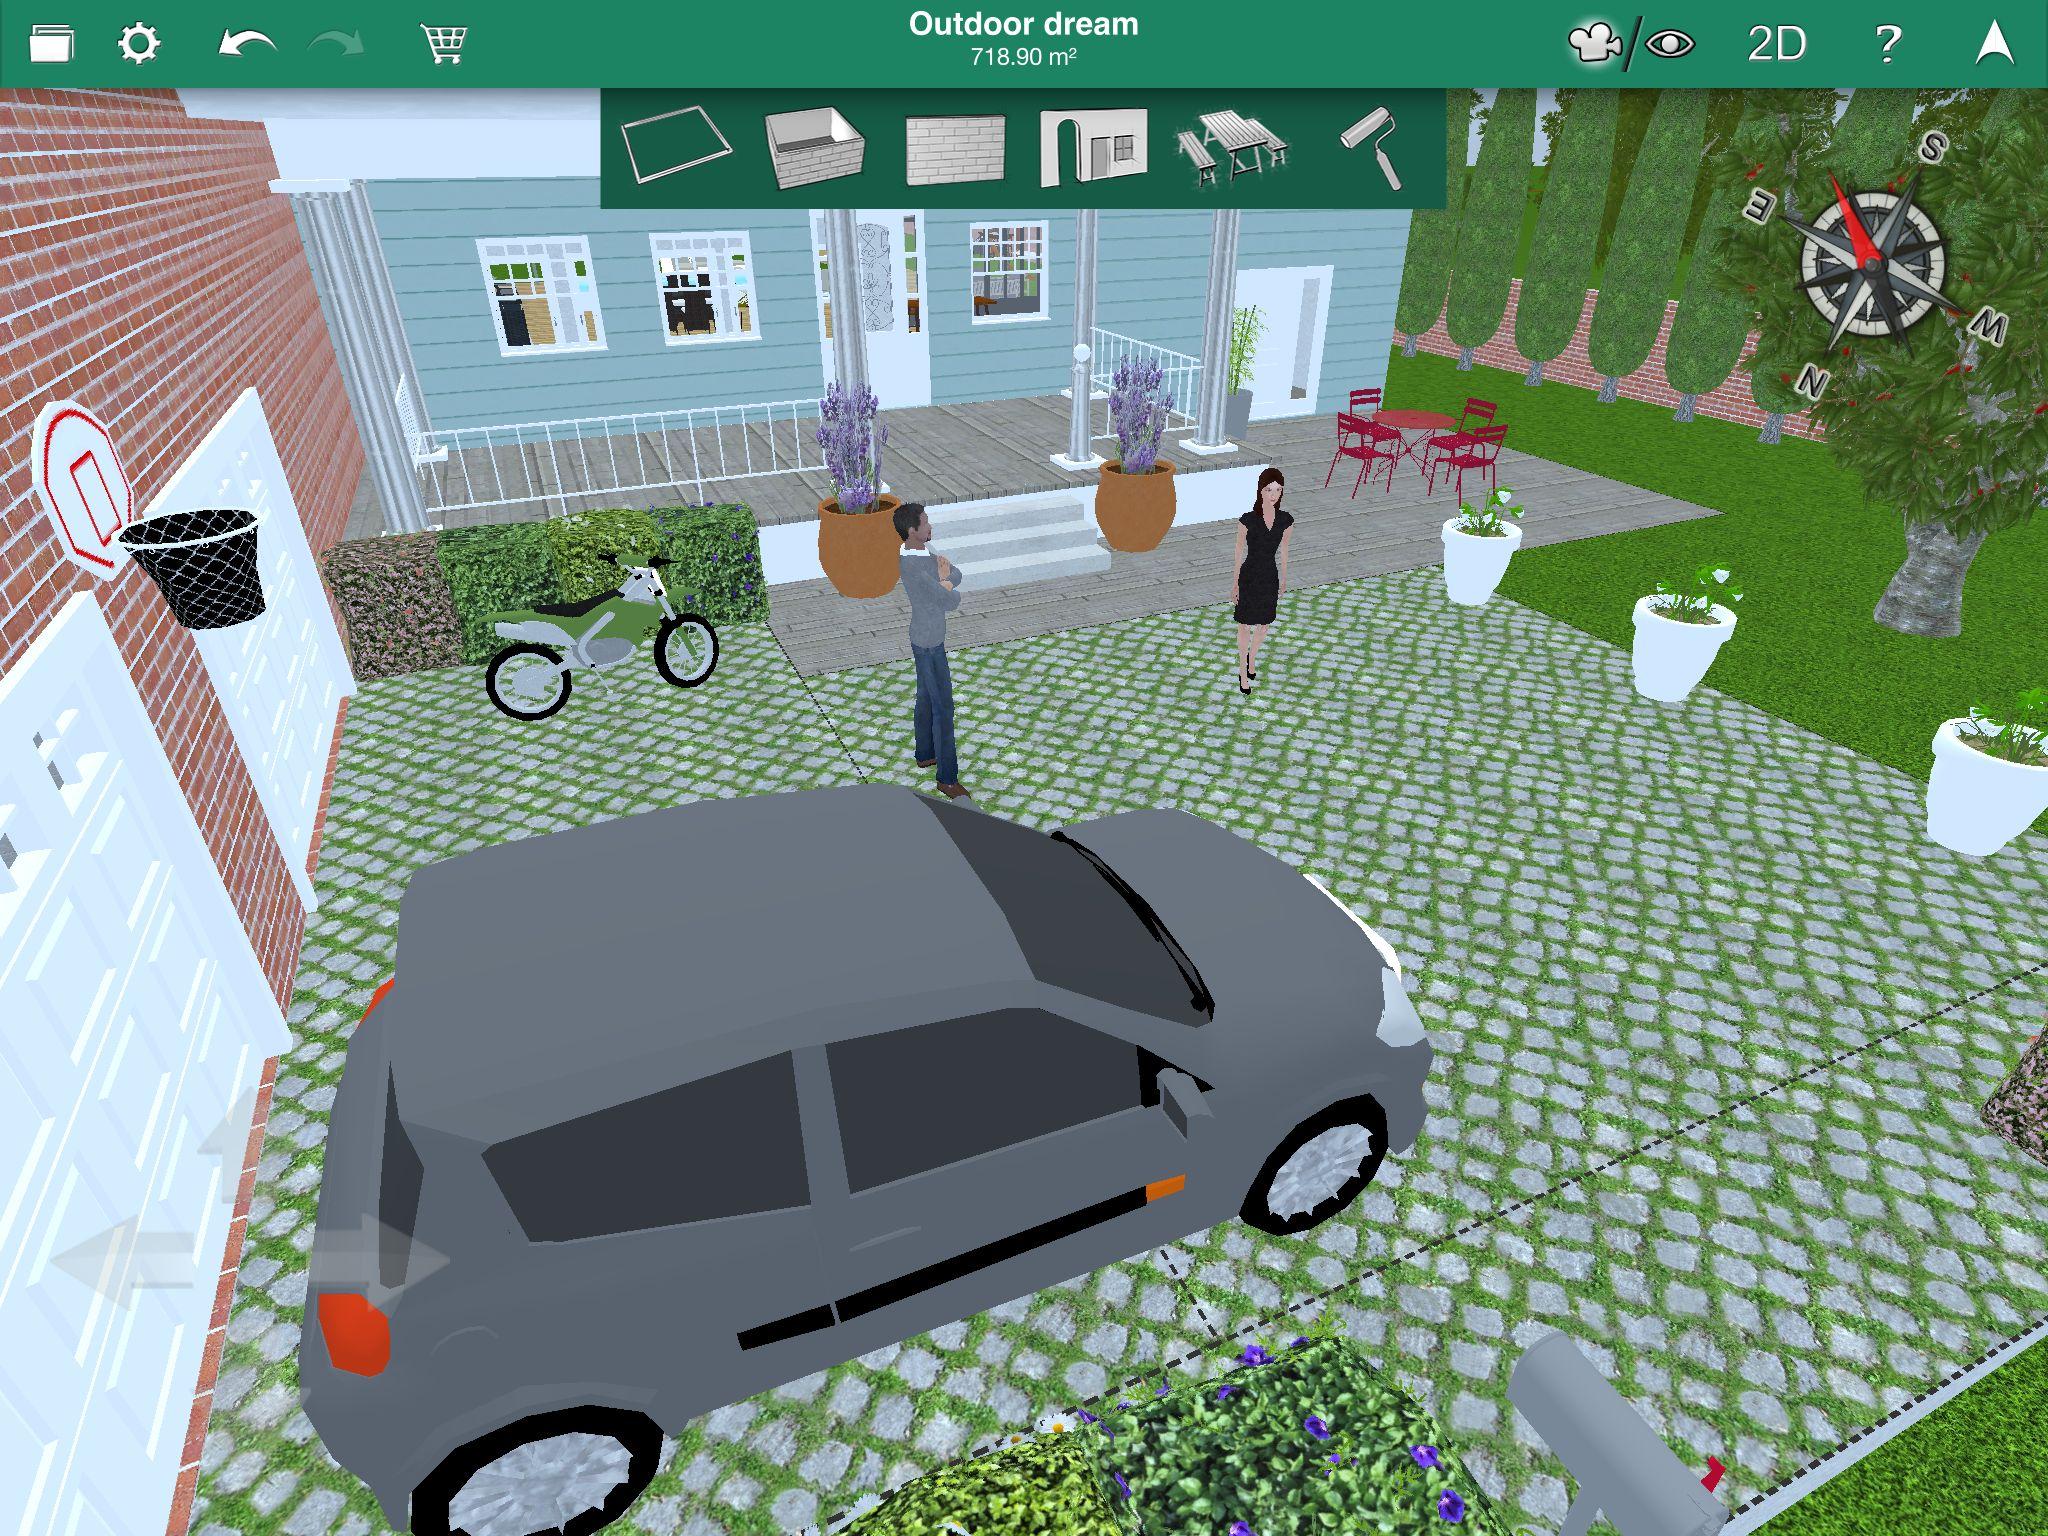 Buy home design 3d outdoor garden cd key at the best price for Home design 3d outdoor garden mod